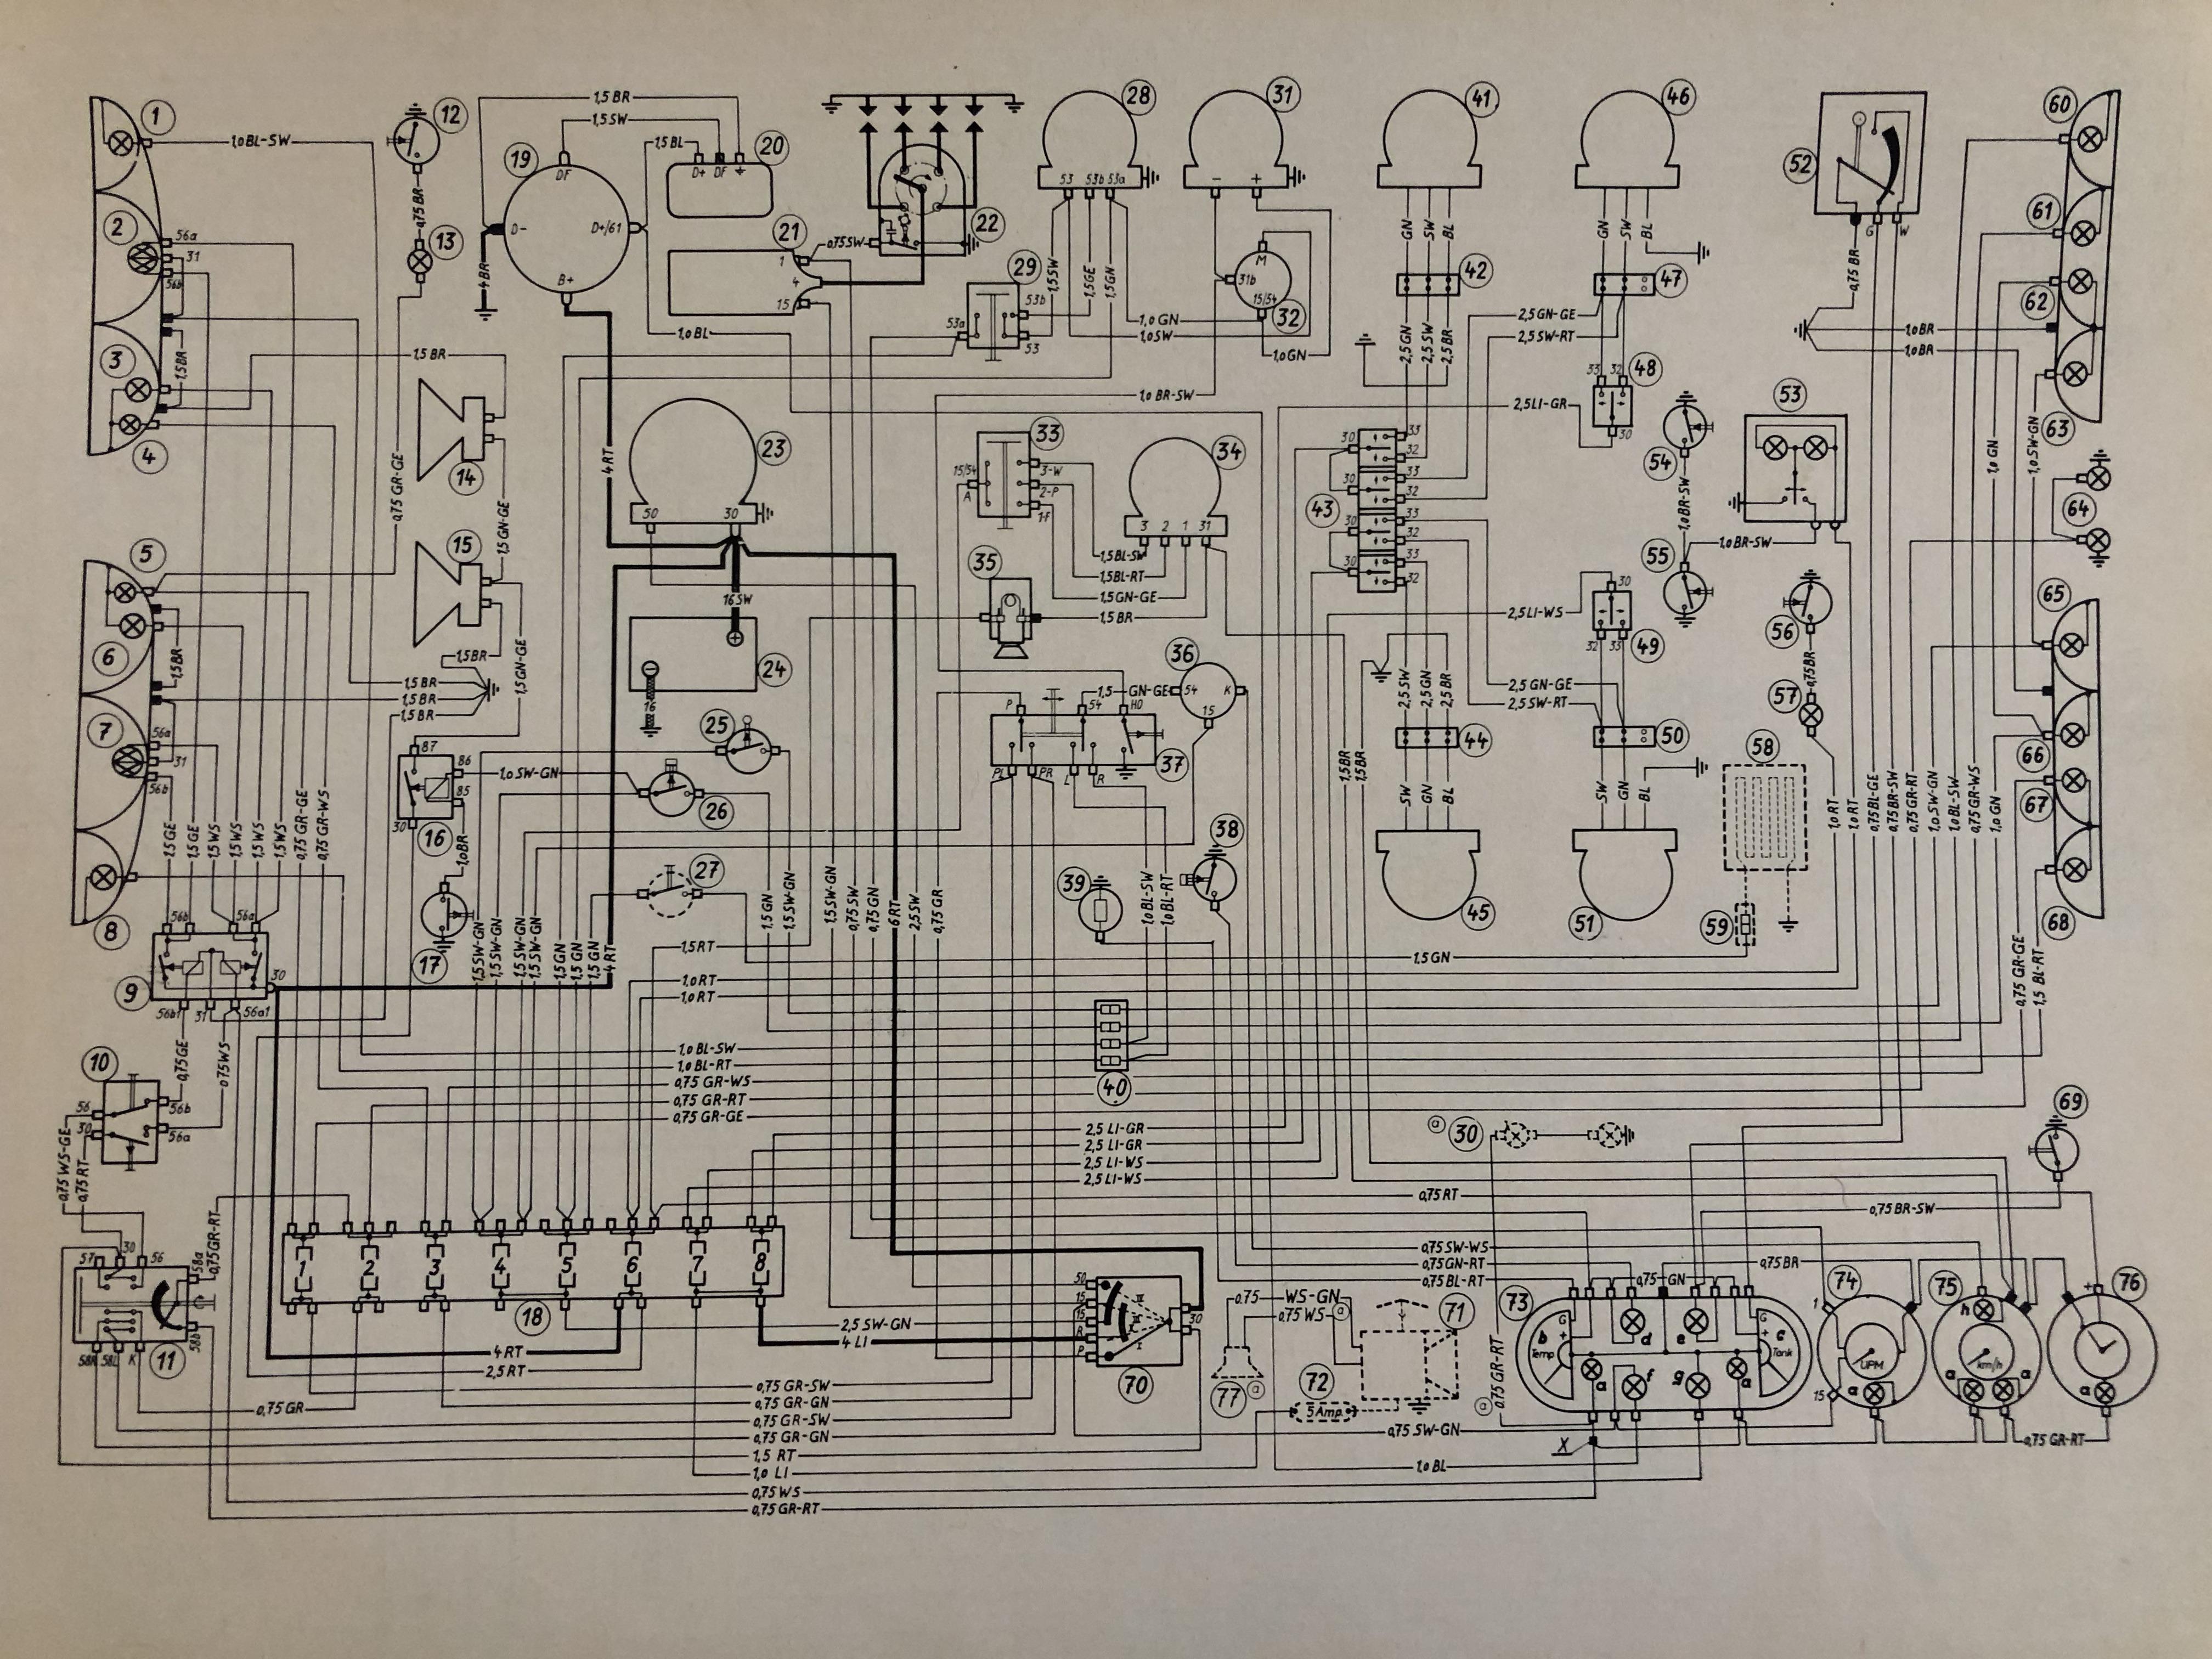 2000 cs with hazard switch wiring diagram - bmw neue klasse discussion - bmw  2002 faq  bmw 2002 faq